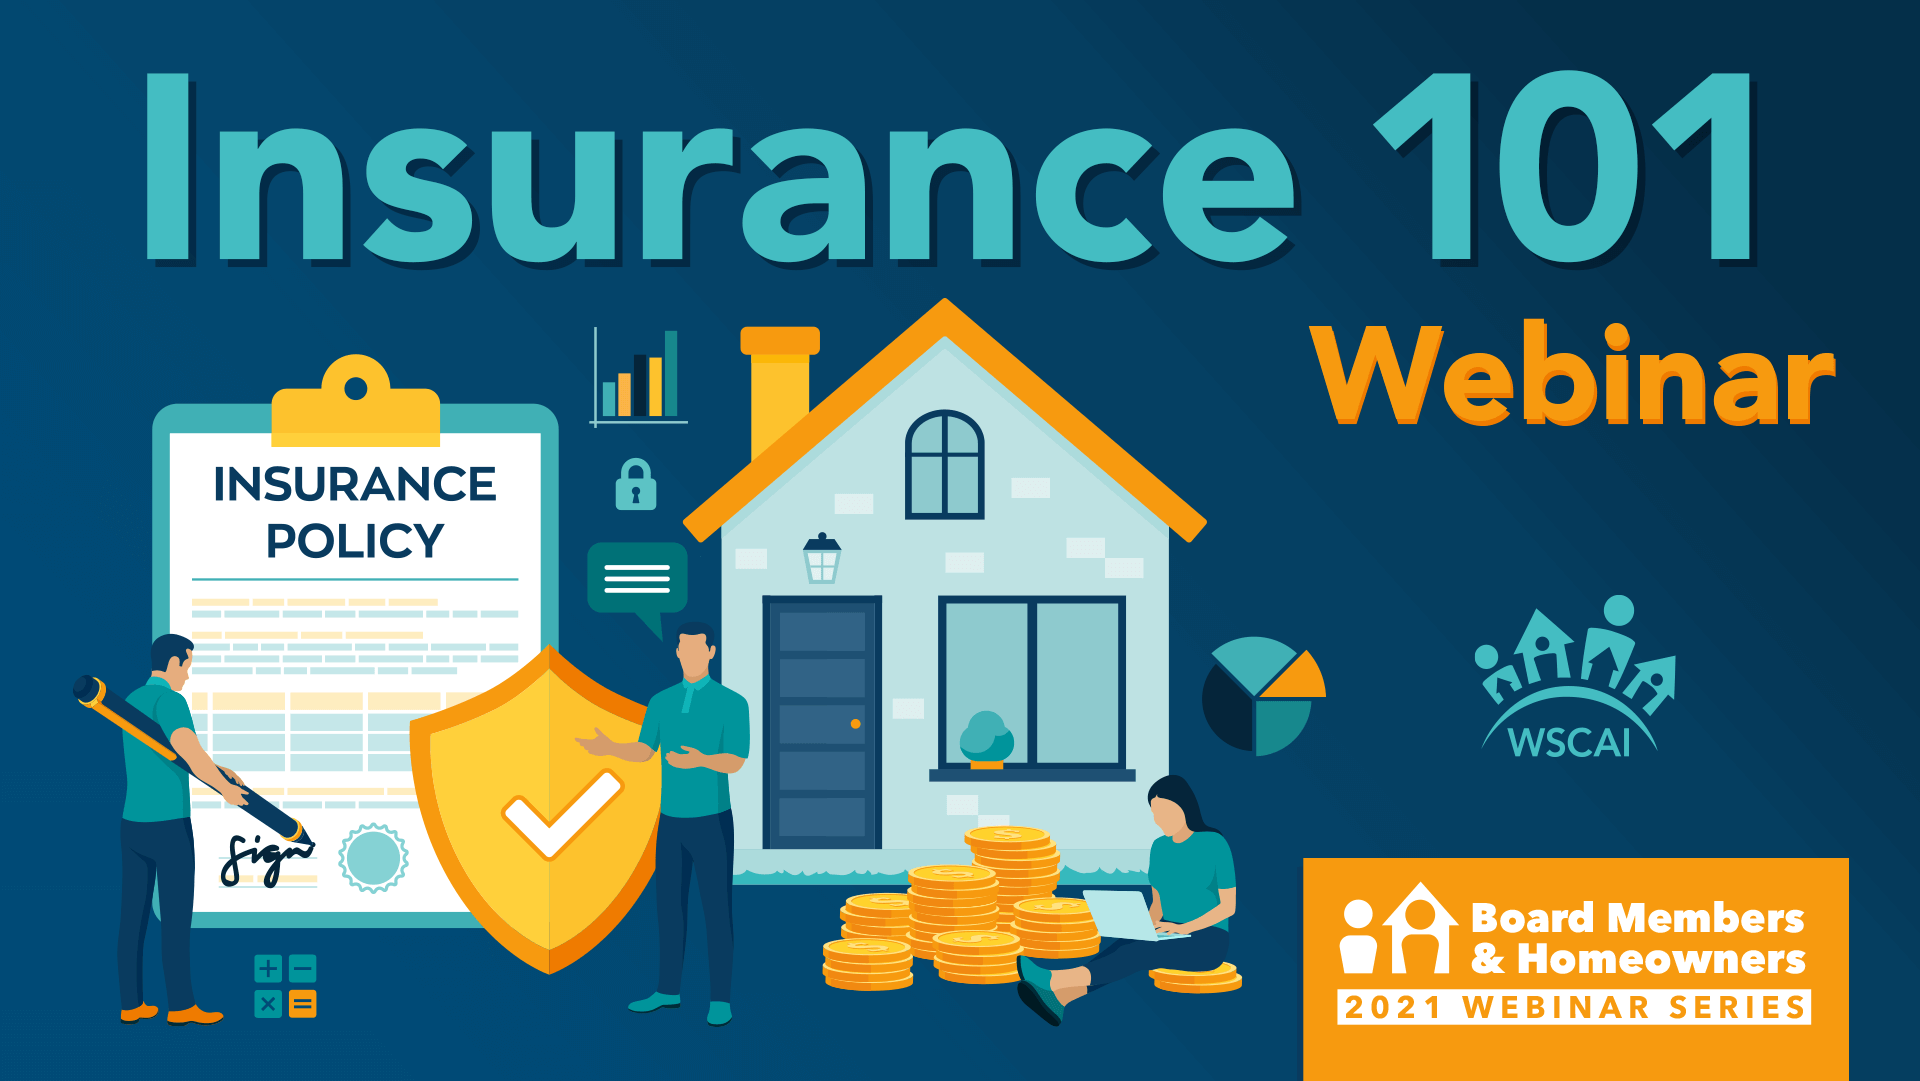 """Insurance 101 Webinar - A Board Member's Guide to a Solid Insurance Package"" - Board Member And Homeowners 2021 Webinar Series"